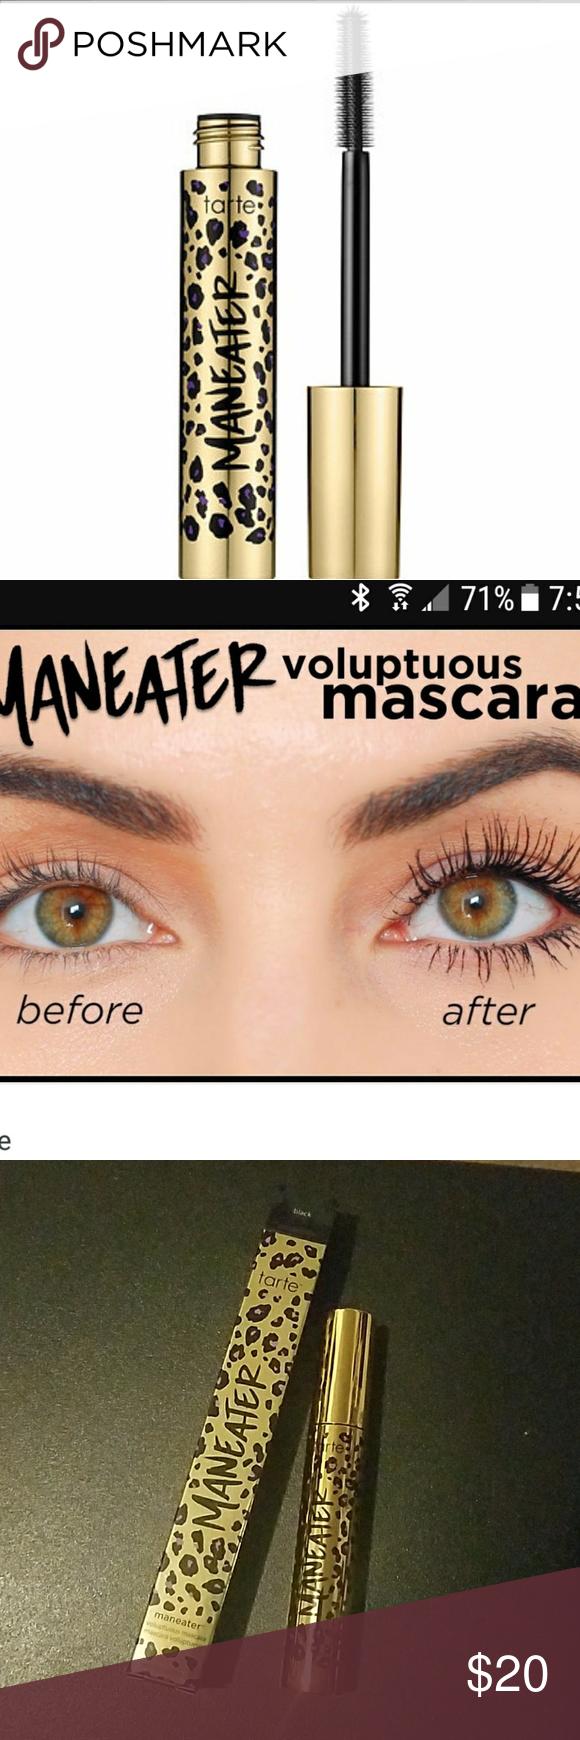 6b4527cc45a Tarte manager black mascara double duty length Brand new in box tarte  double-duty Beauty